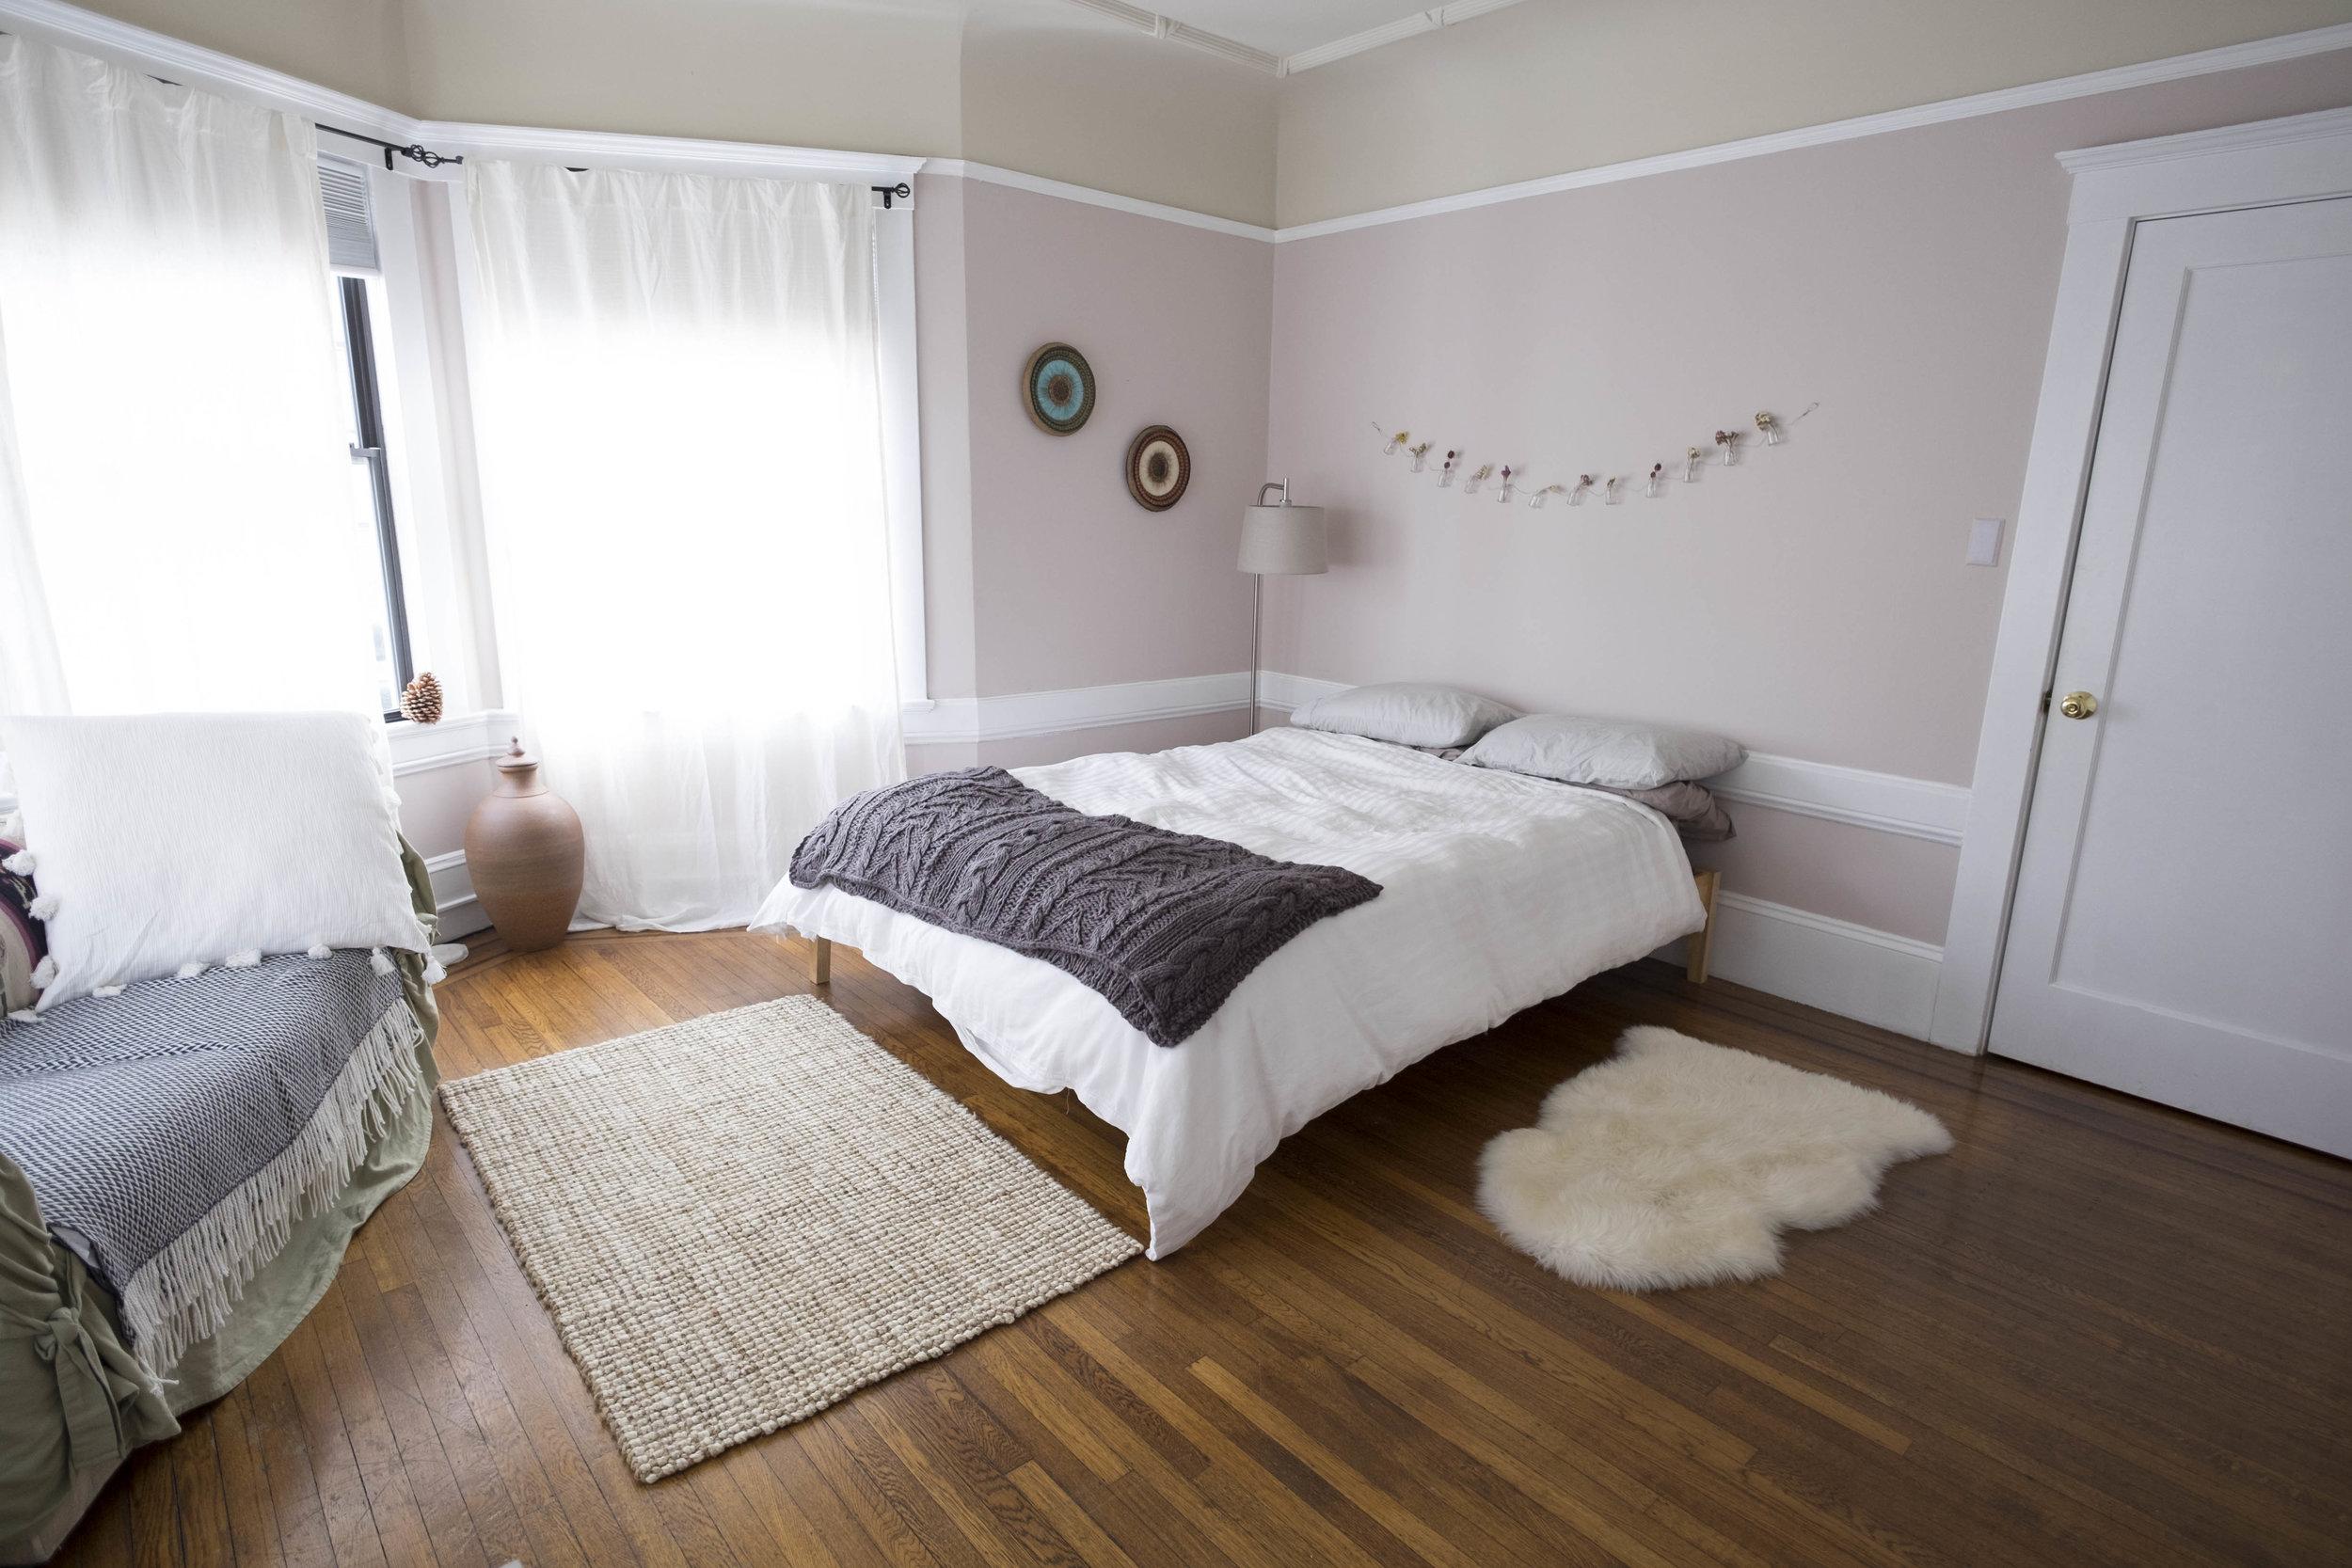 2101California_Bedroom3_(3_of_3).jpg